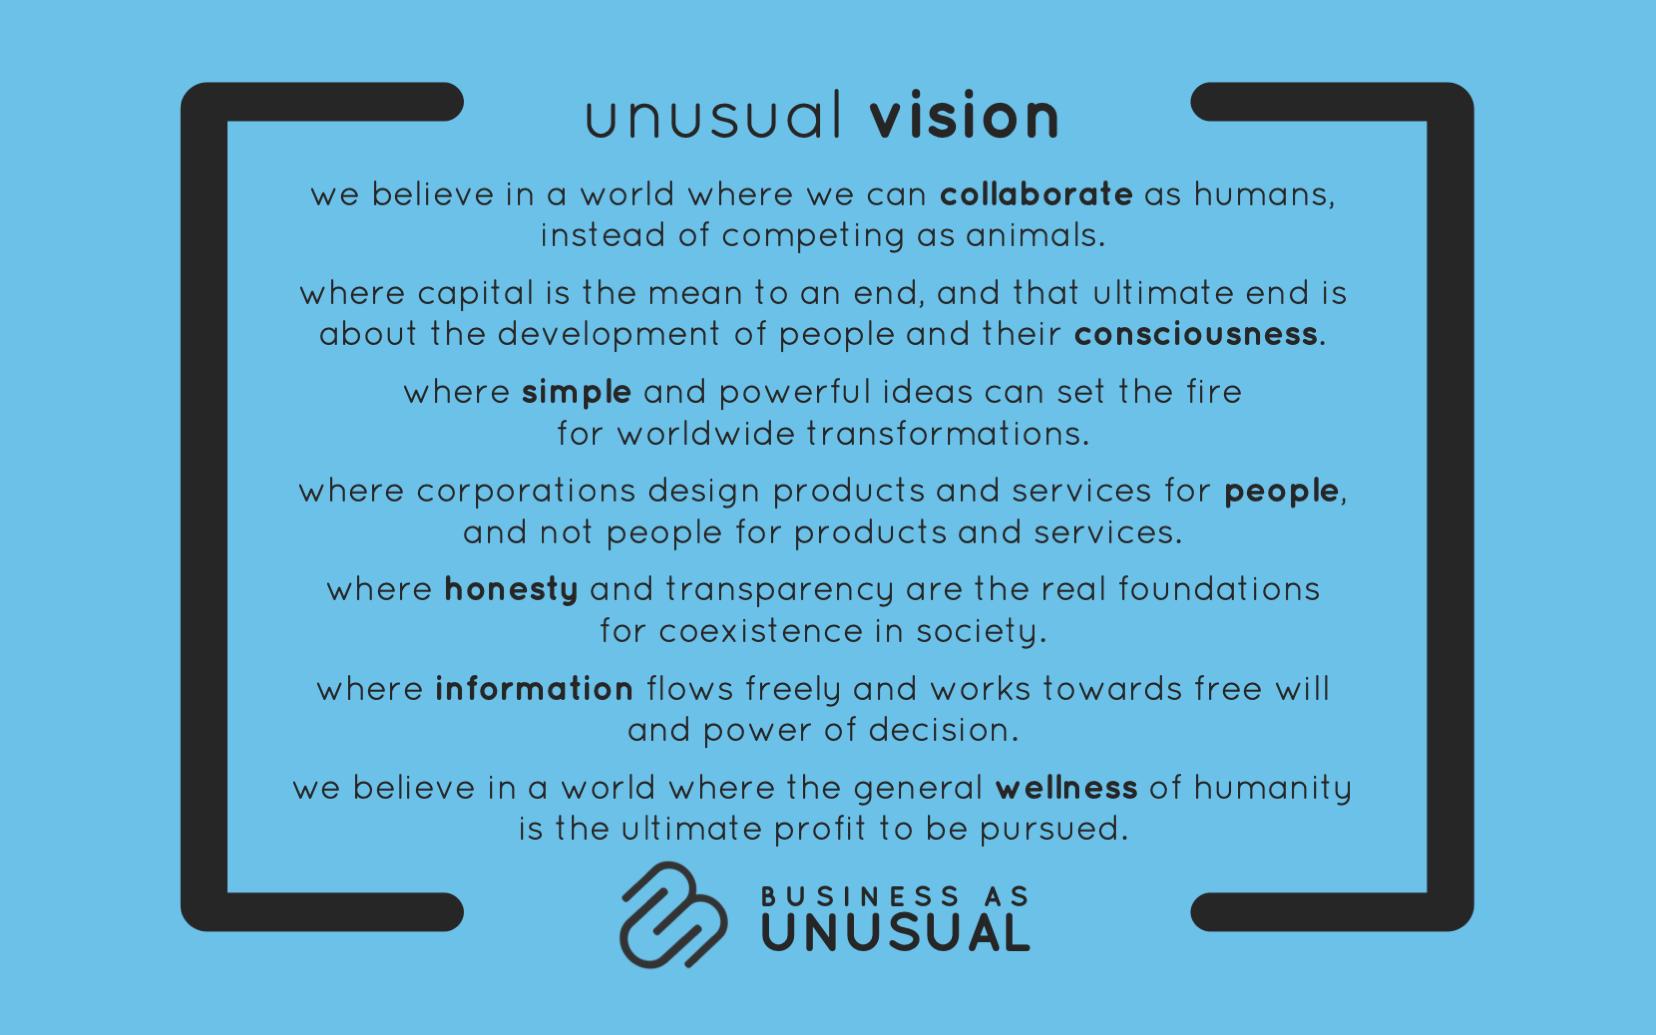 unusual vision